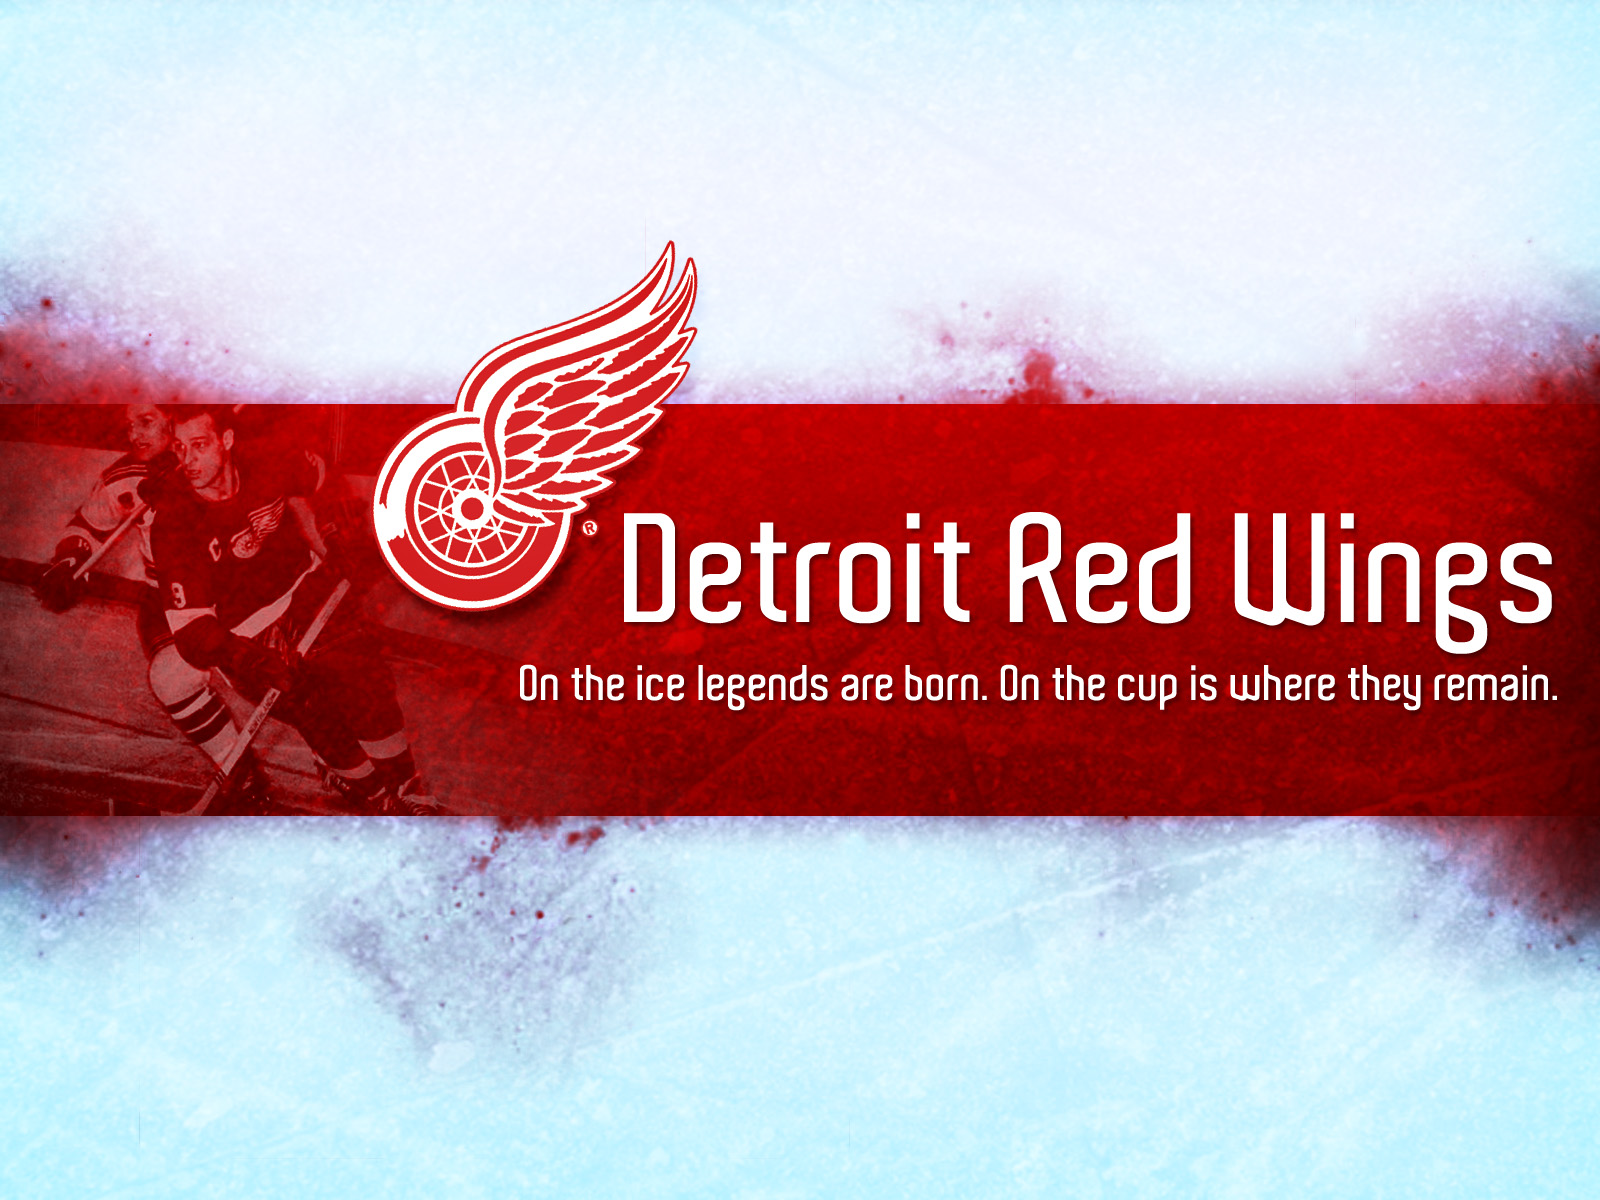 detroit_wall_1600-red+wings.jpg width=